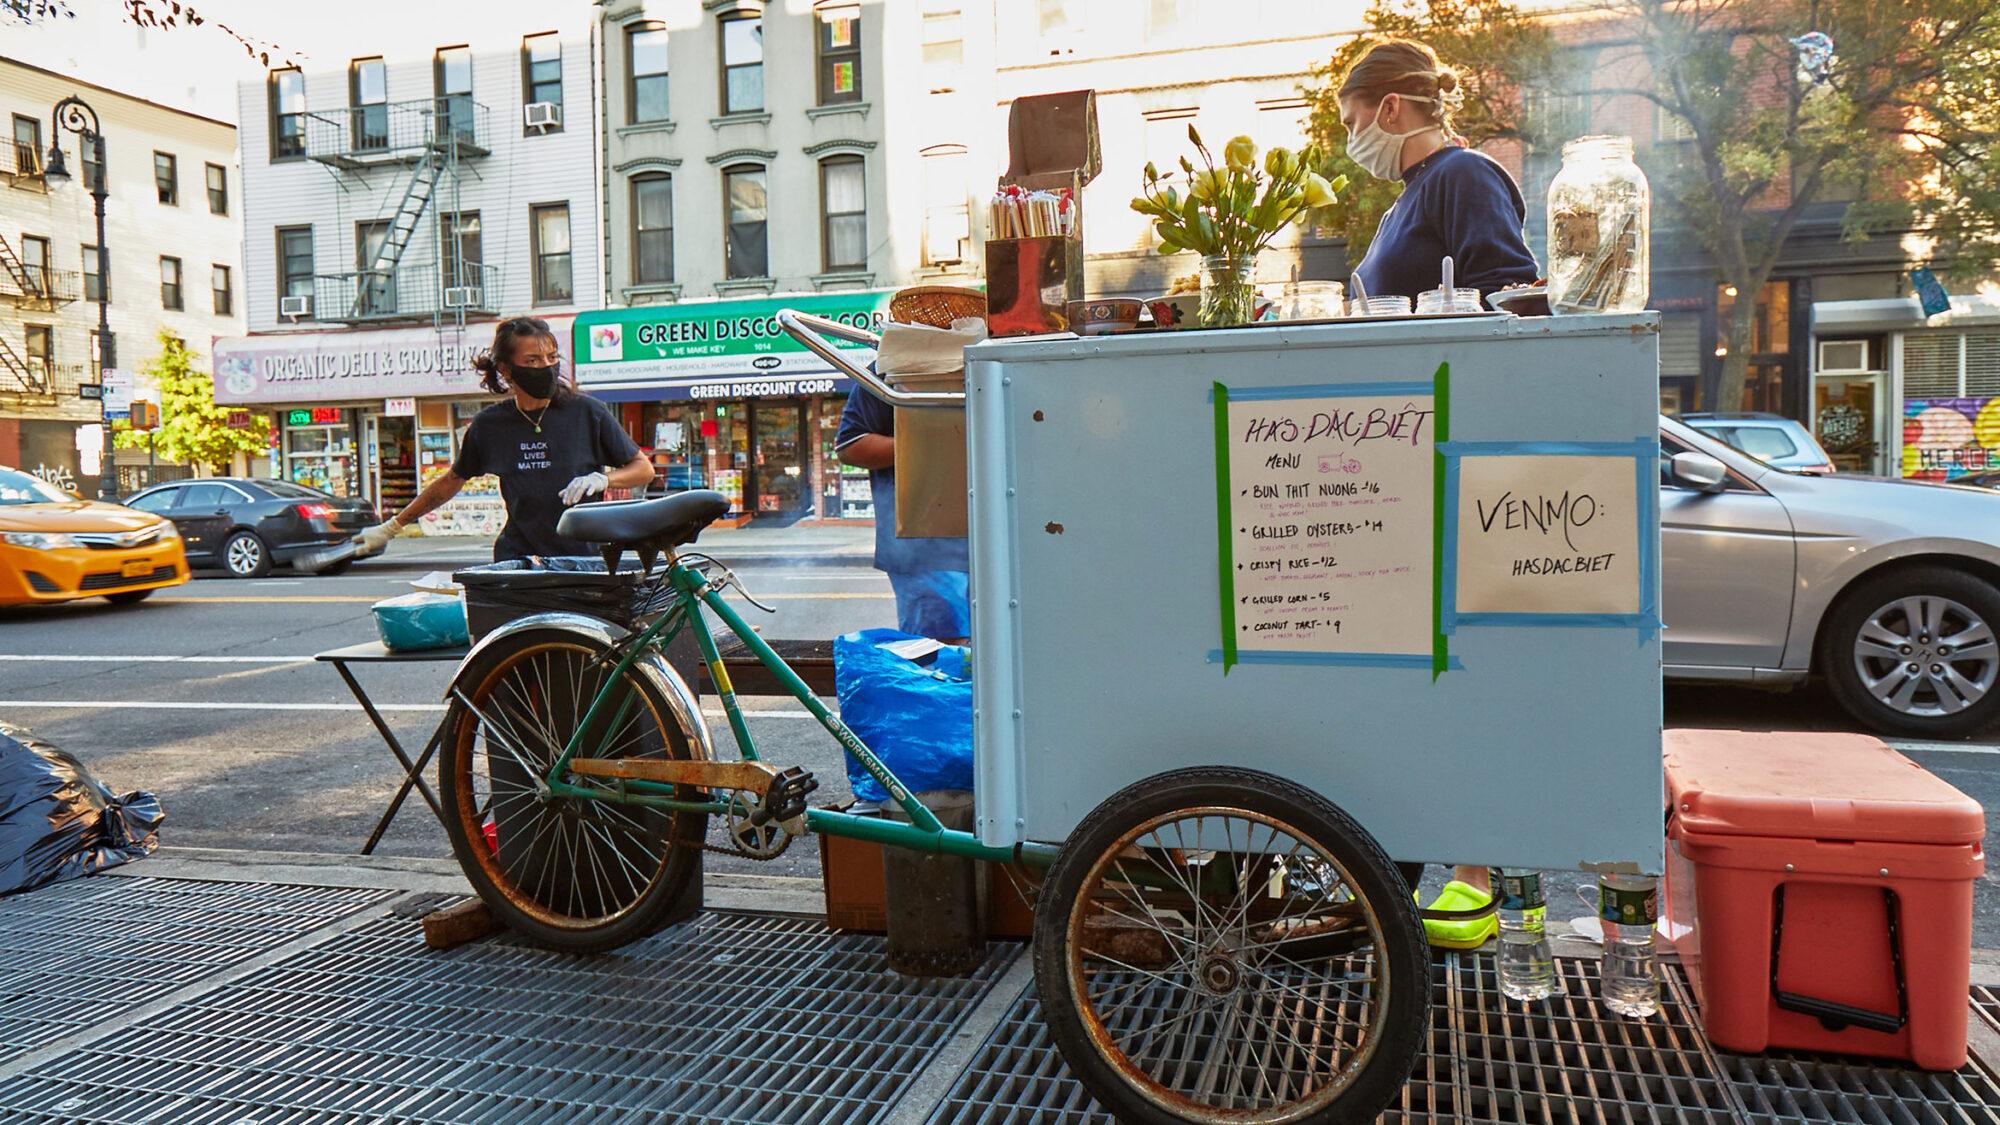 Article-Has-Dac-Biet-Pop-Up-Food-Truck